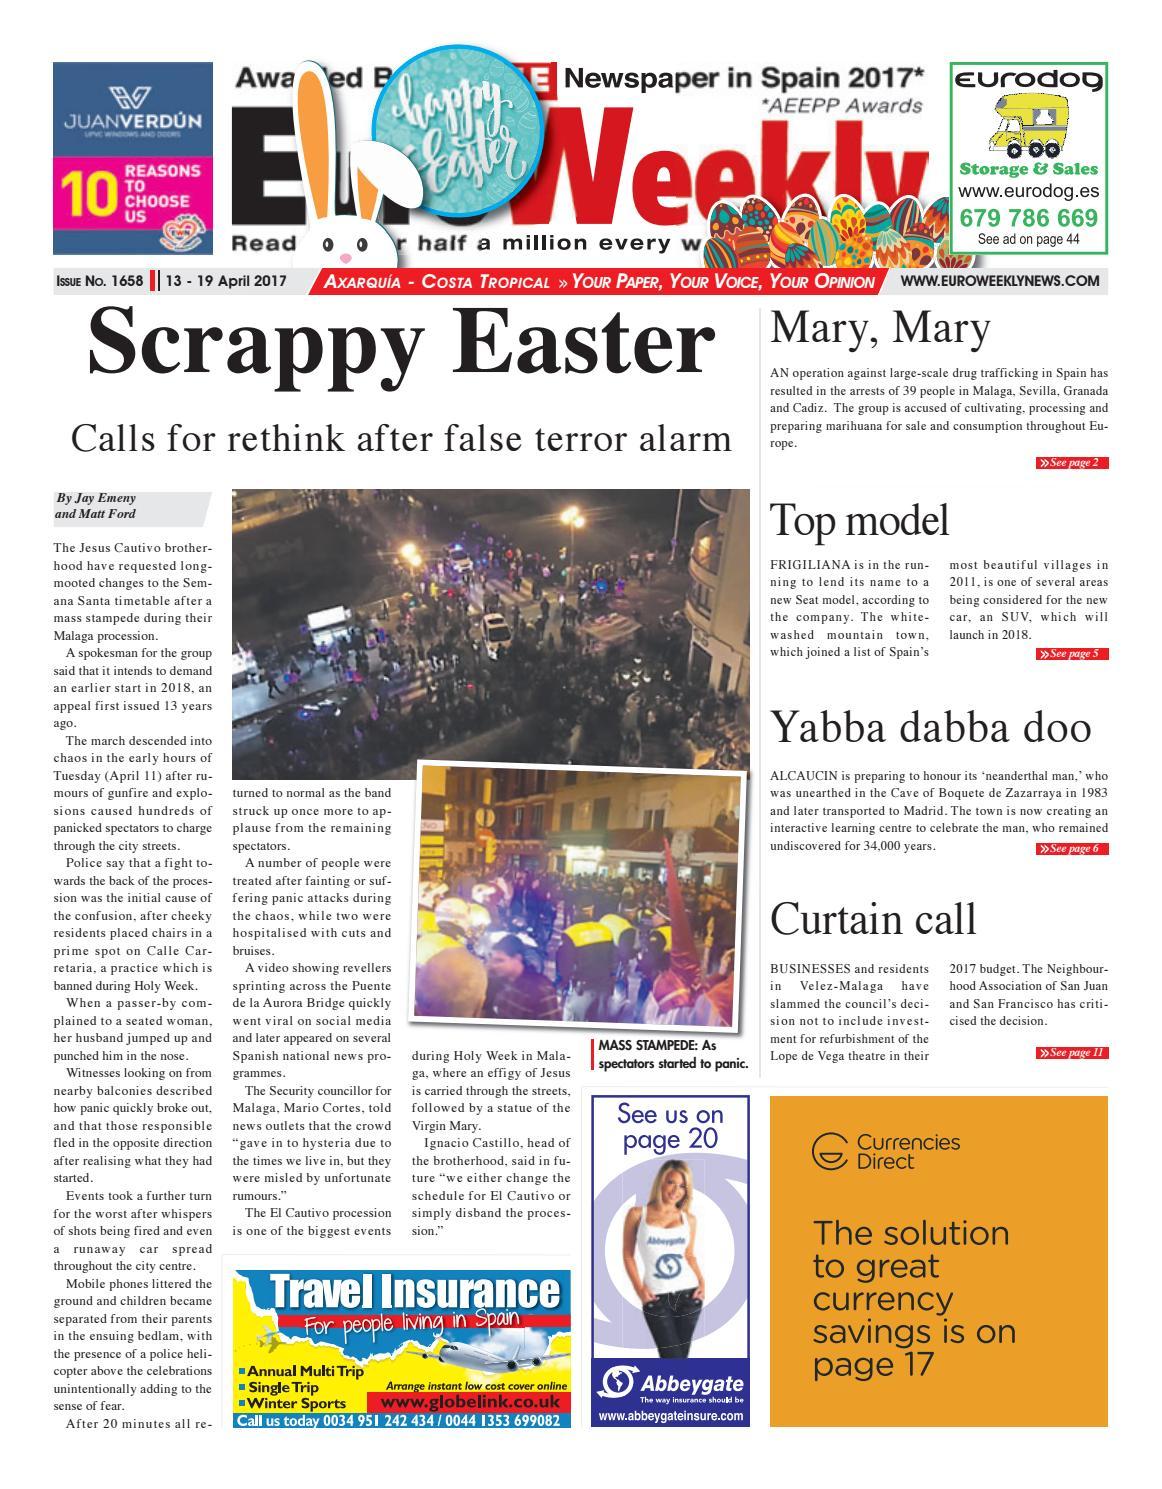 Actor Porno En Tenerife 2017 euro weekly news - axarquia 13 - 19 april 2017 issue 1658